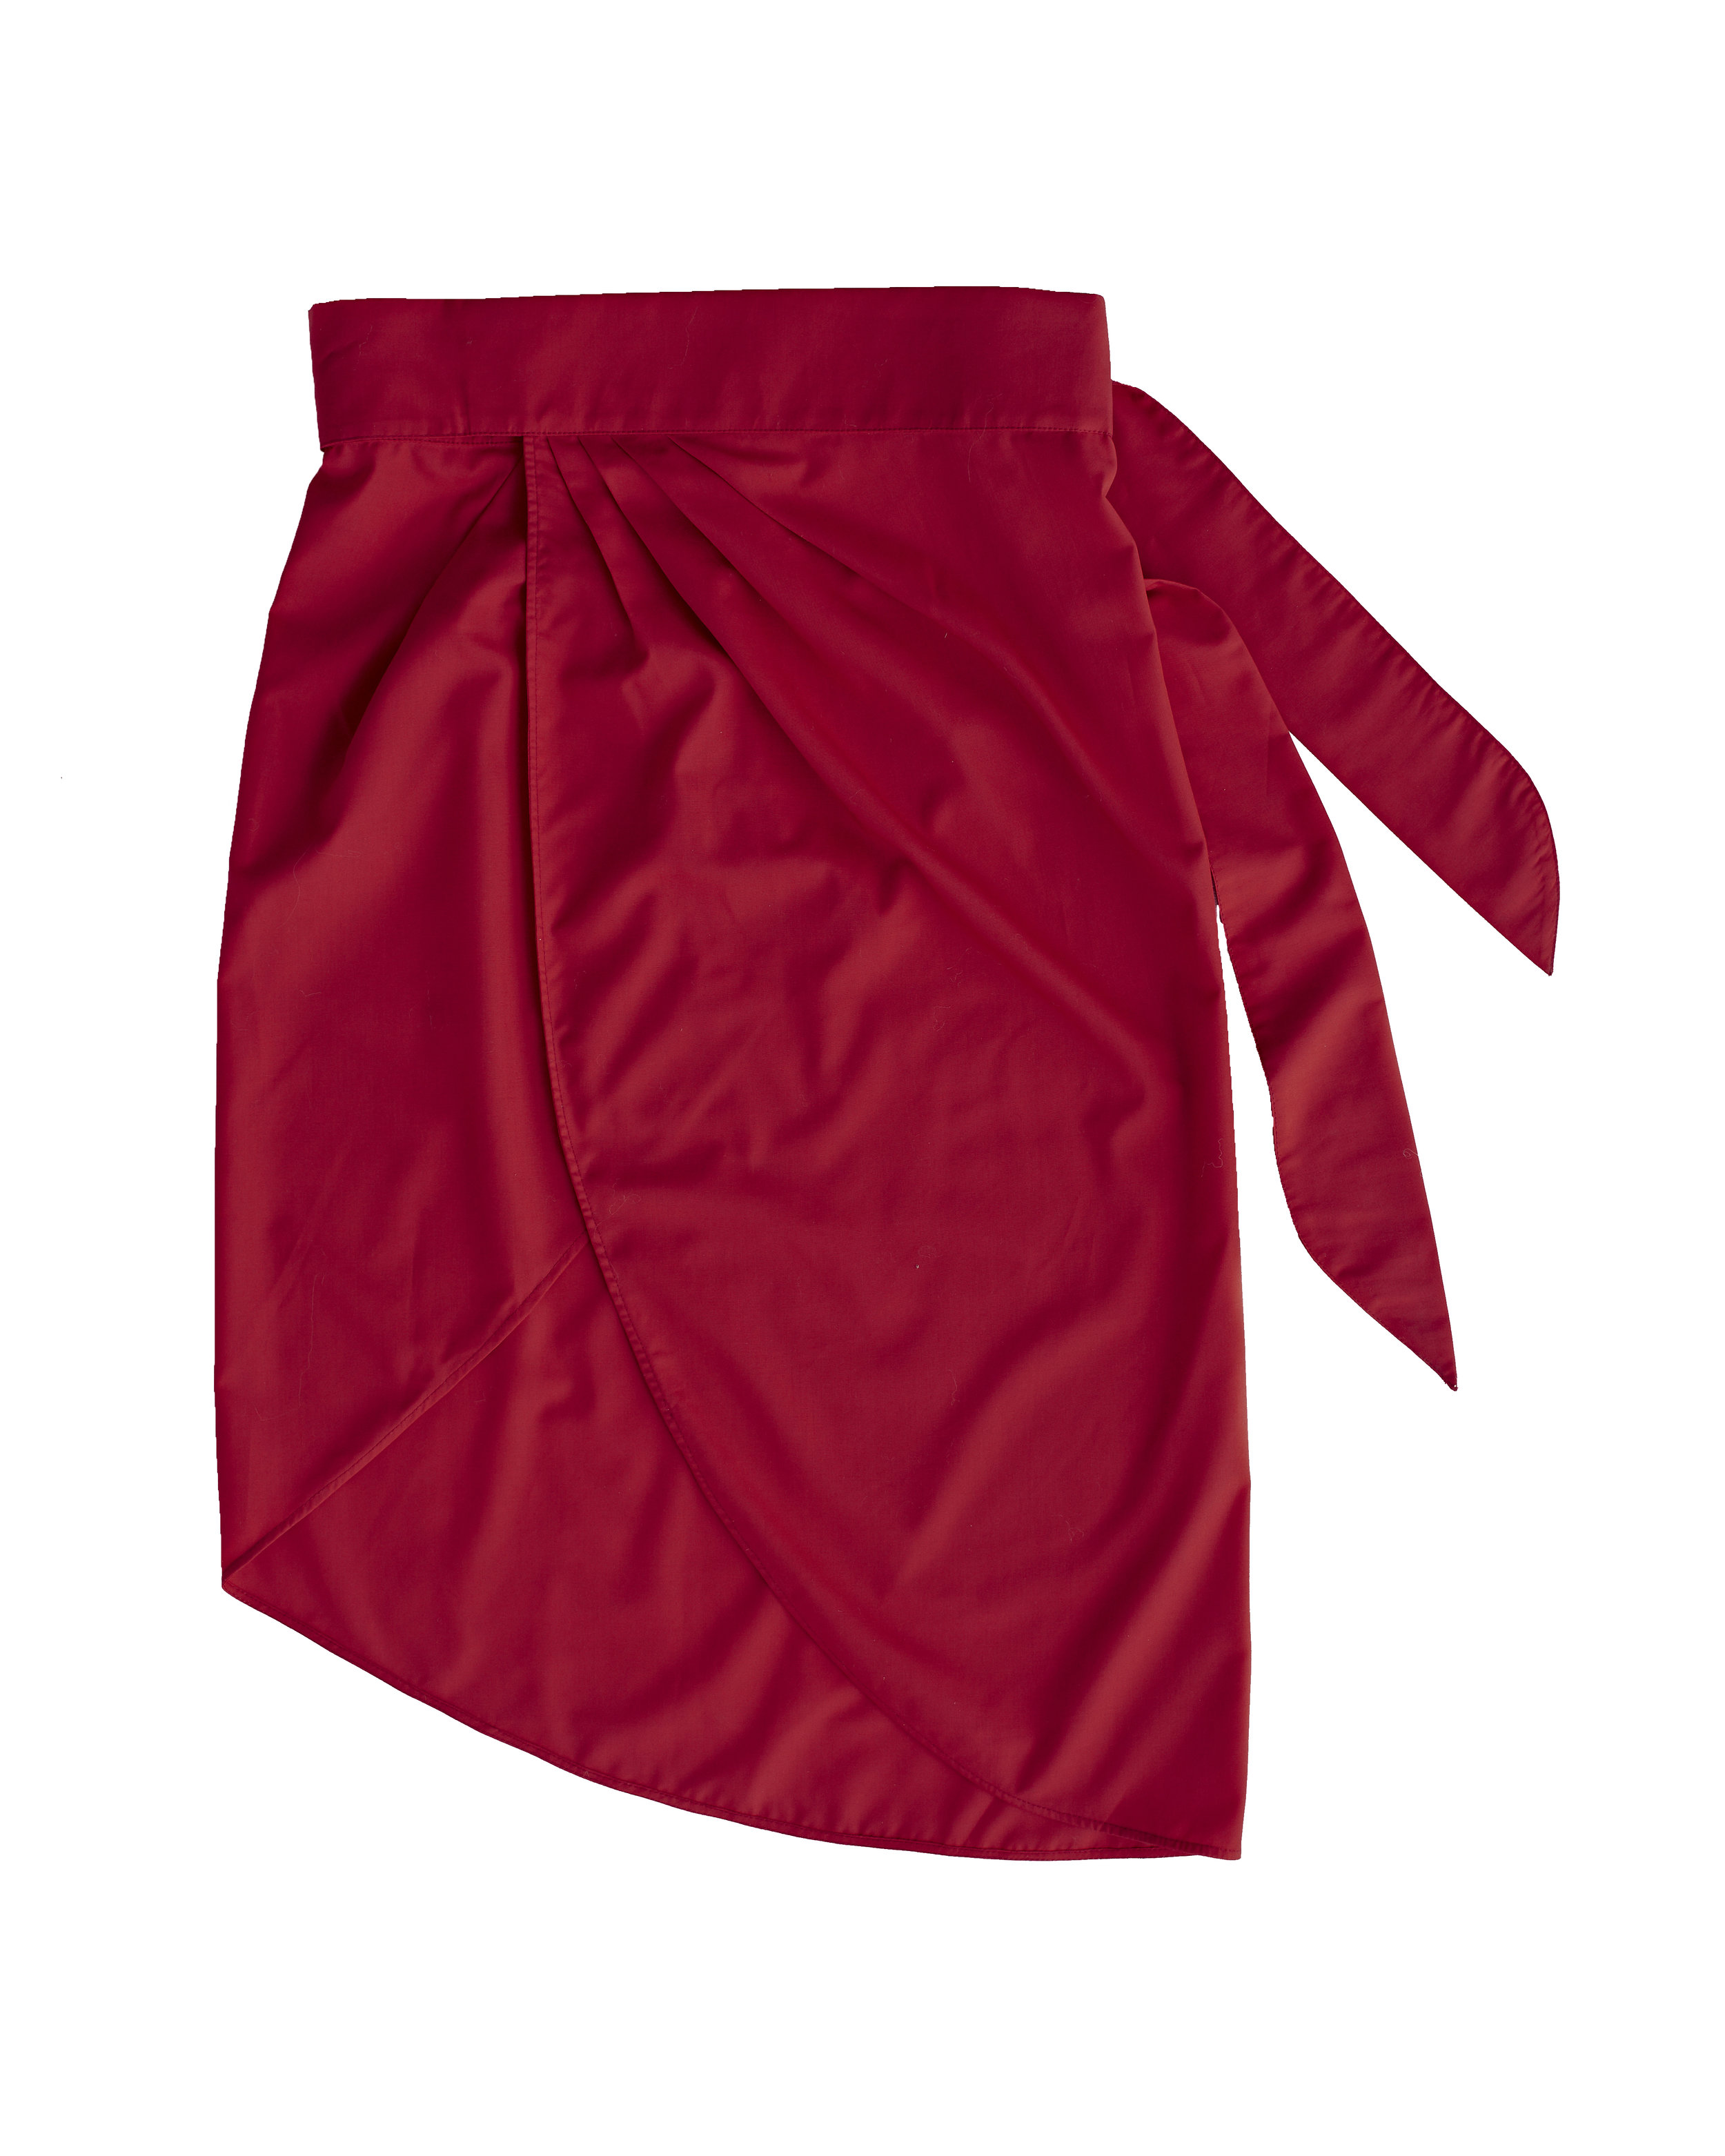 Half length butterfly skirt olors available